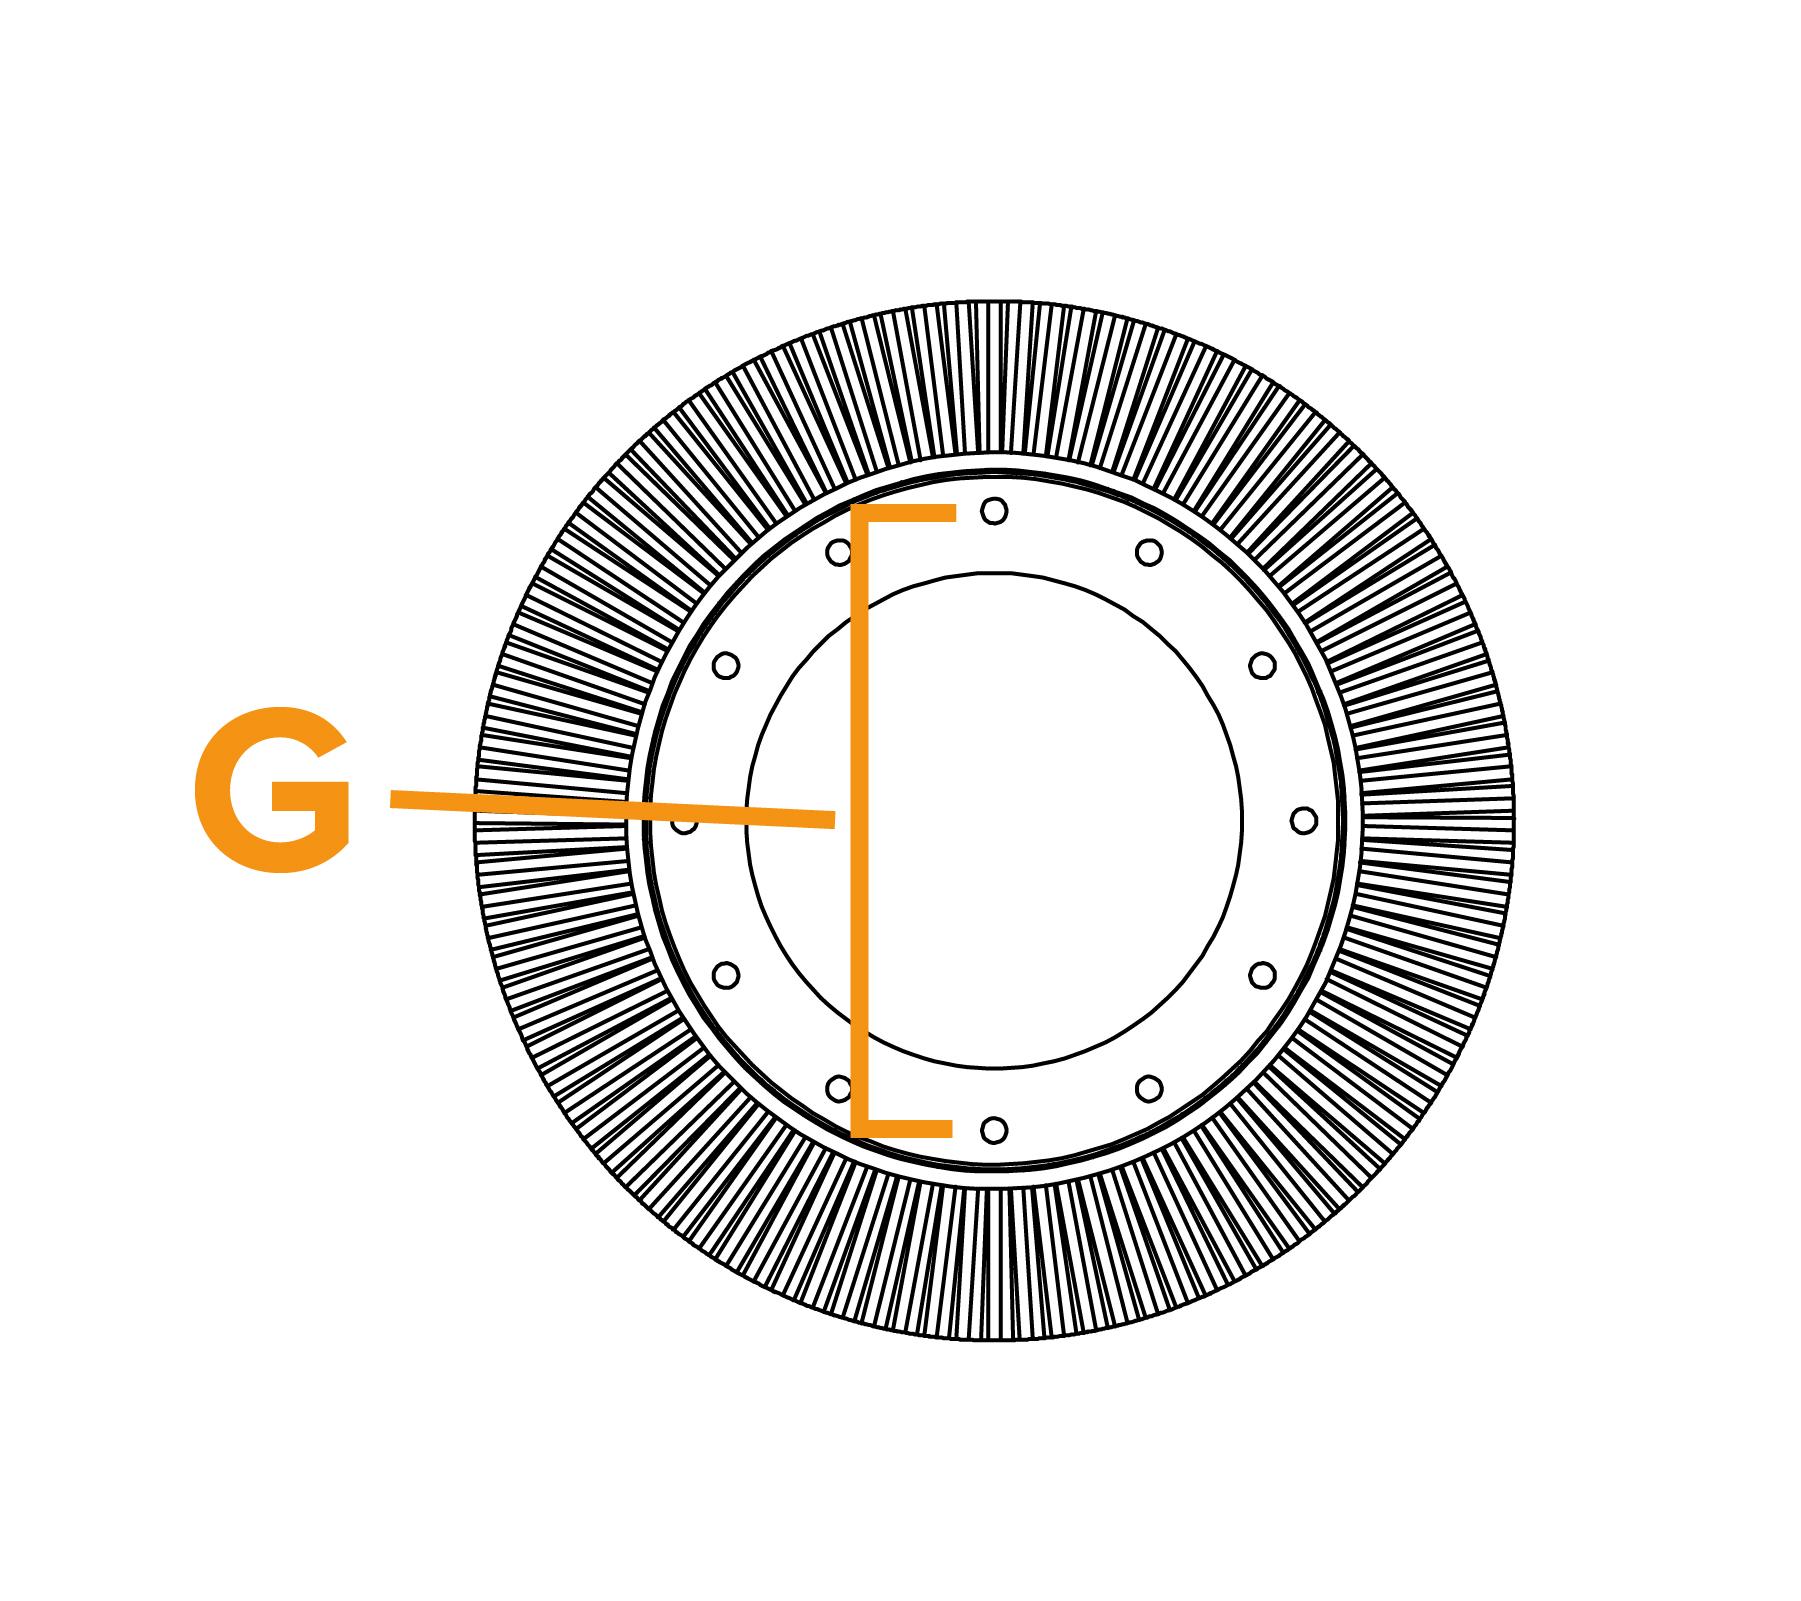 Potloodringborstel met grote diameter - diagram G